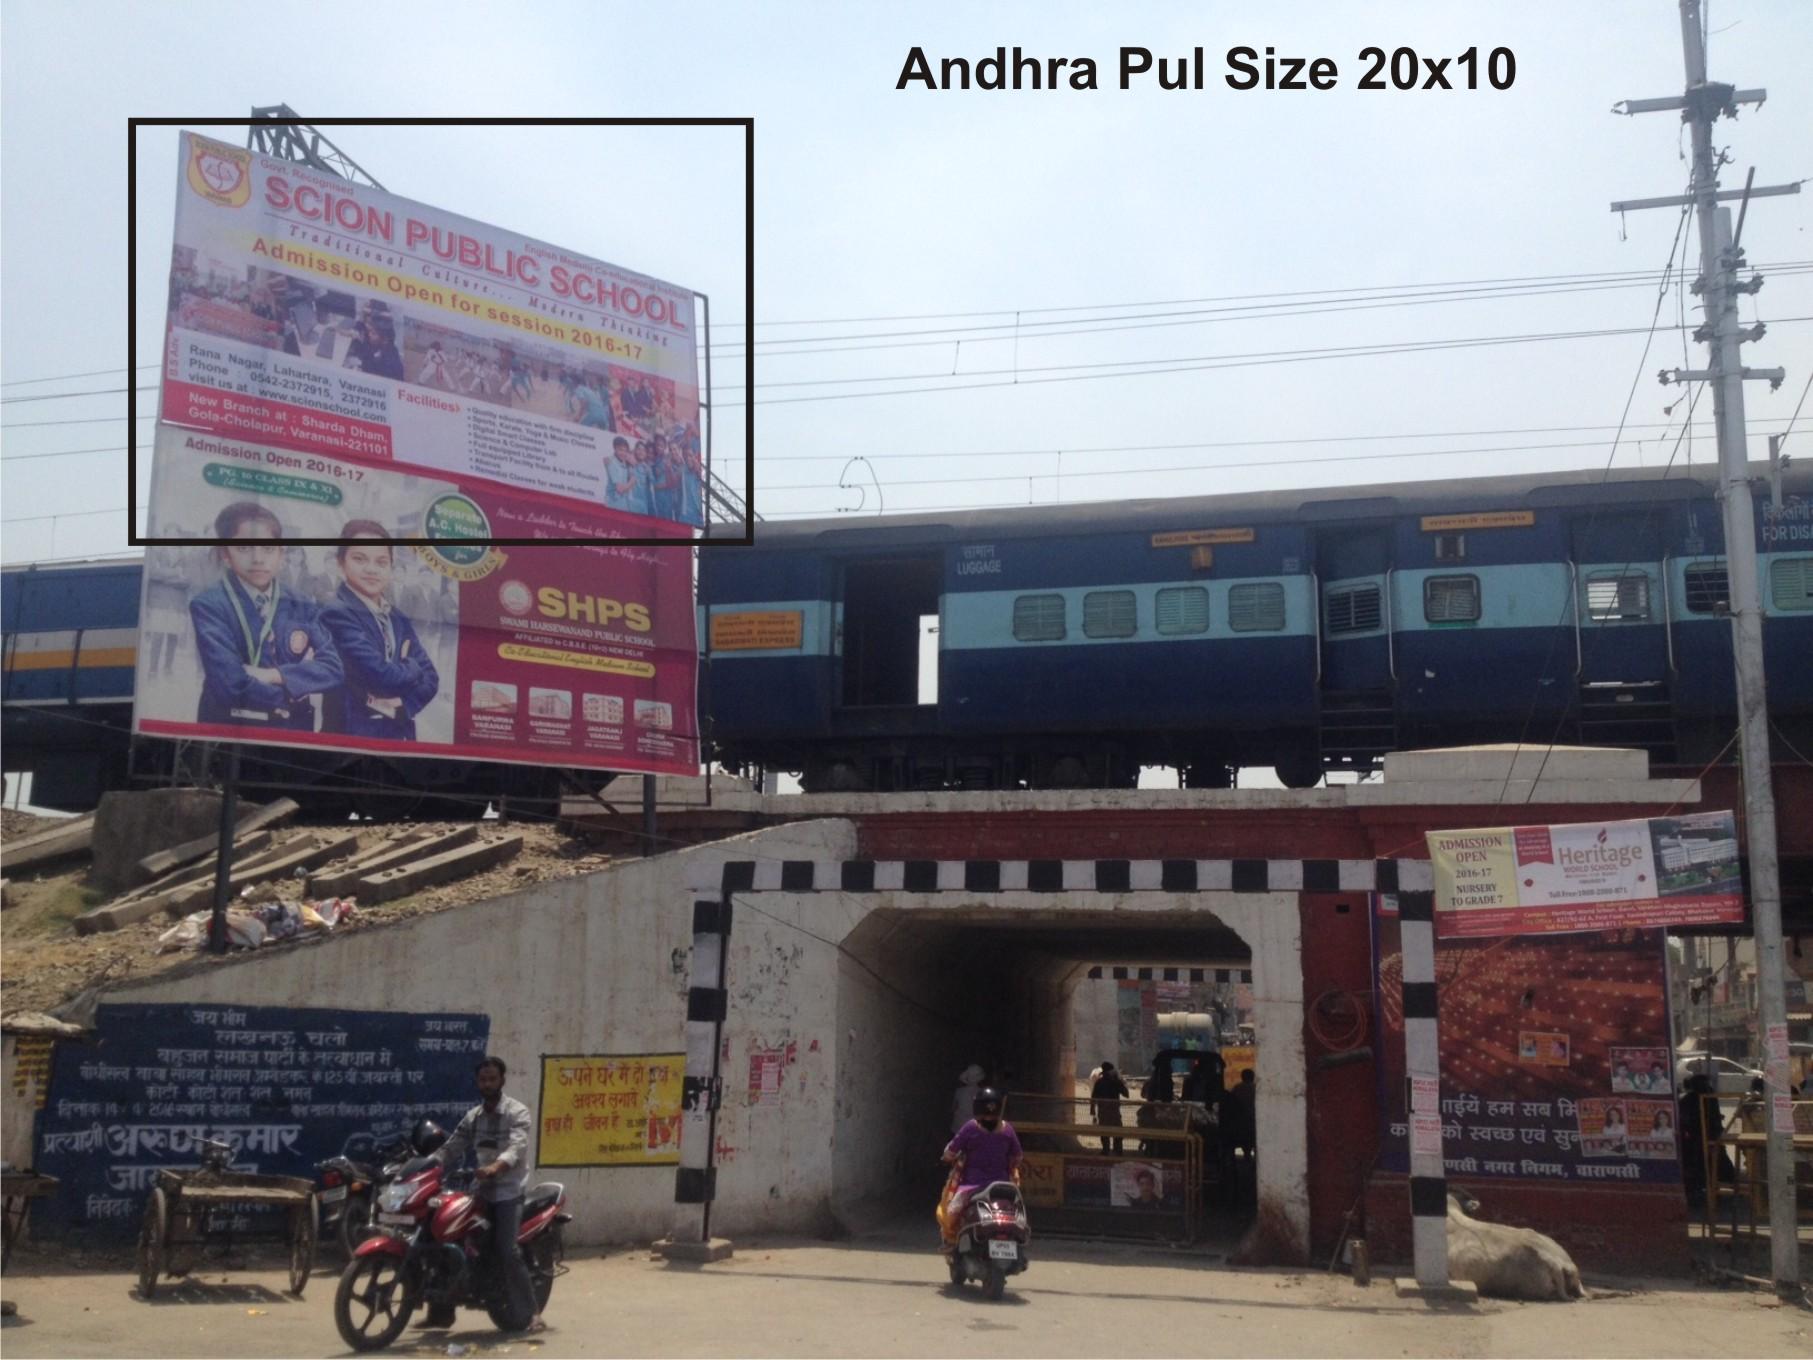 ANDHRA PUL, Varanasi